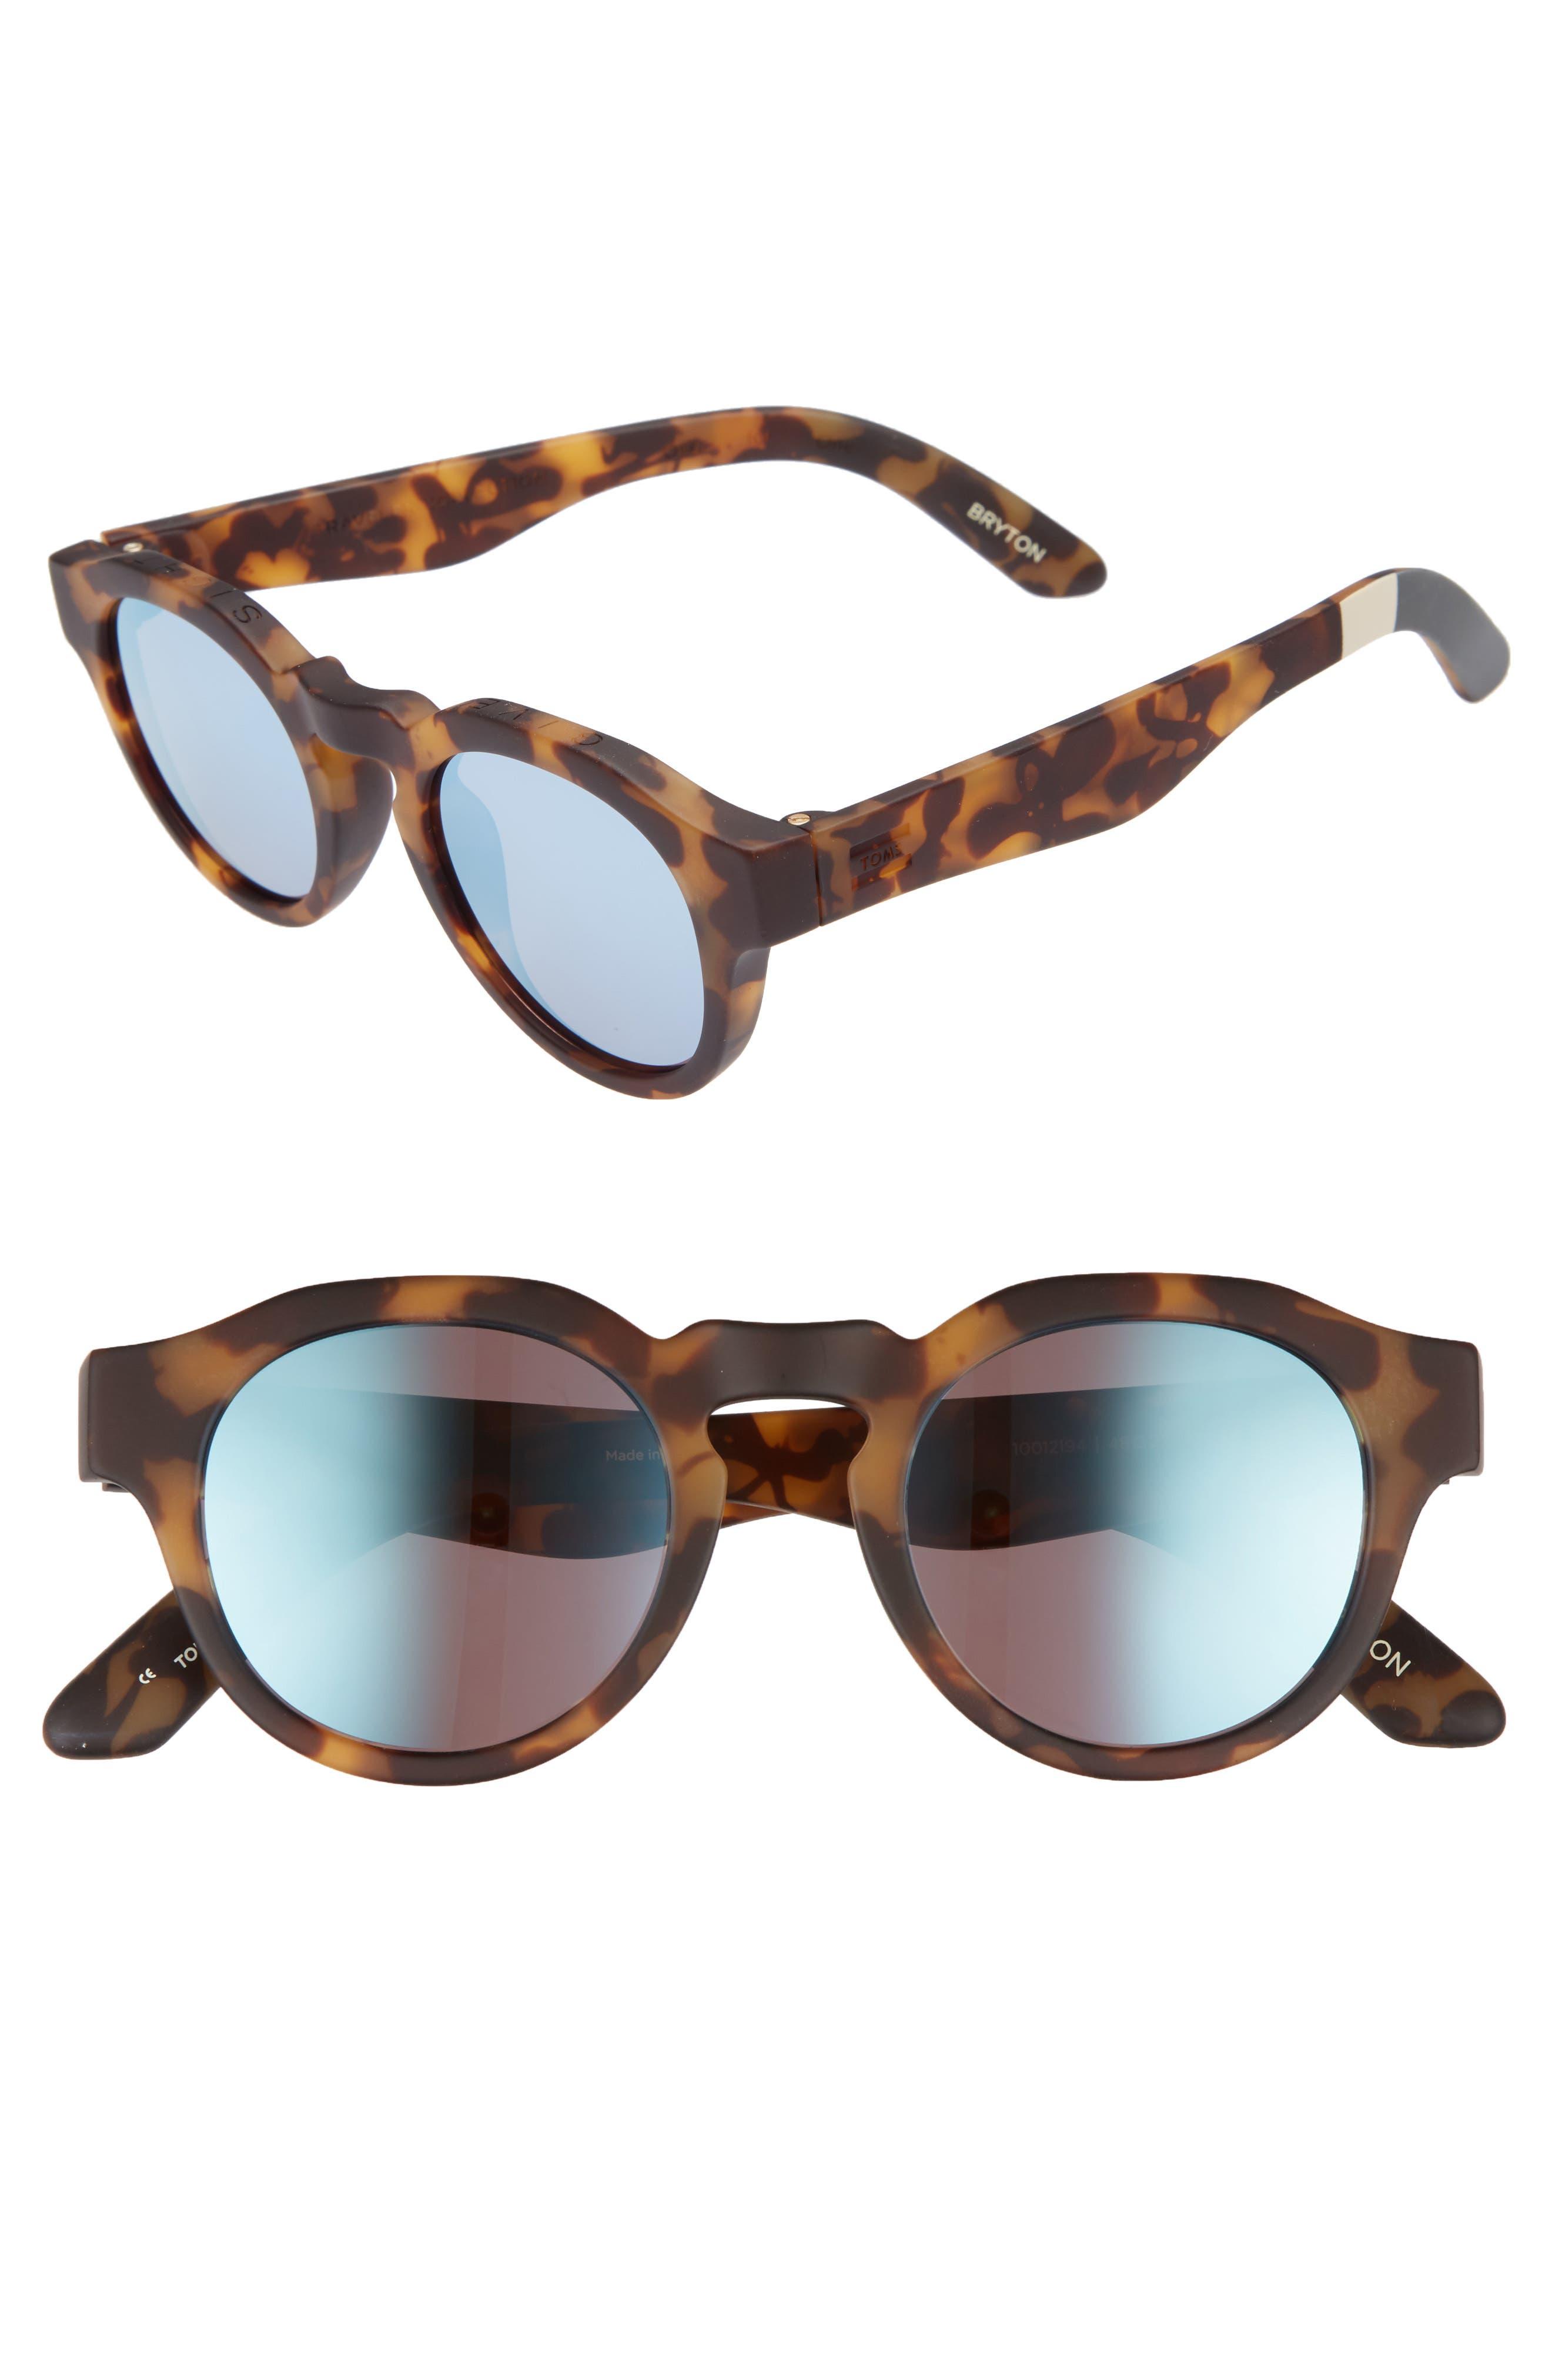 Bryton 48mm Sunglasses,                         Main,                         color, 200